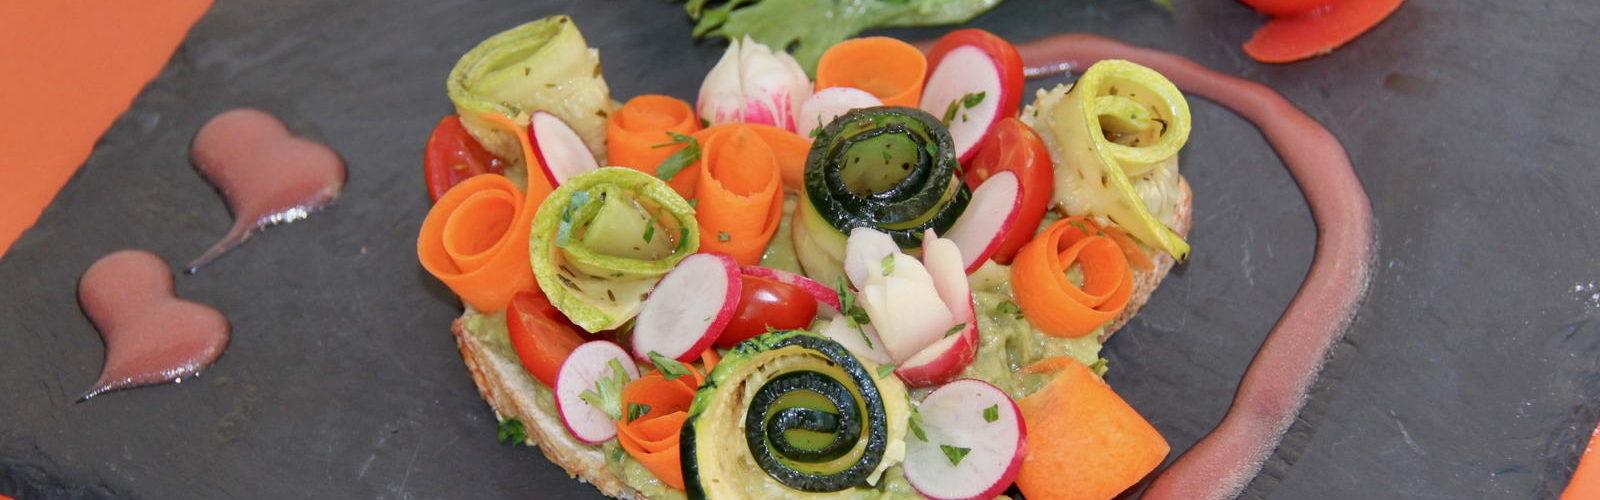 pitchoun-bakery-menu-saint-valentin-fevrier-2019-07